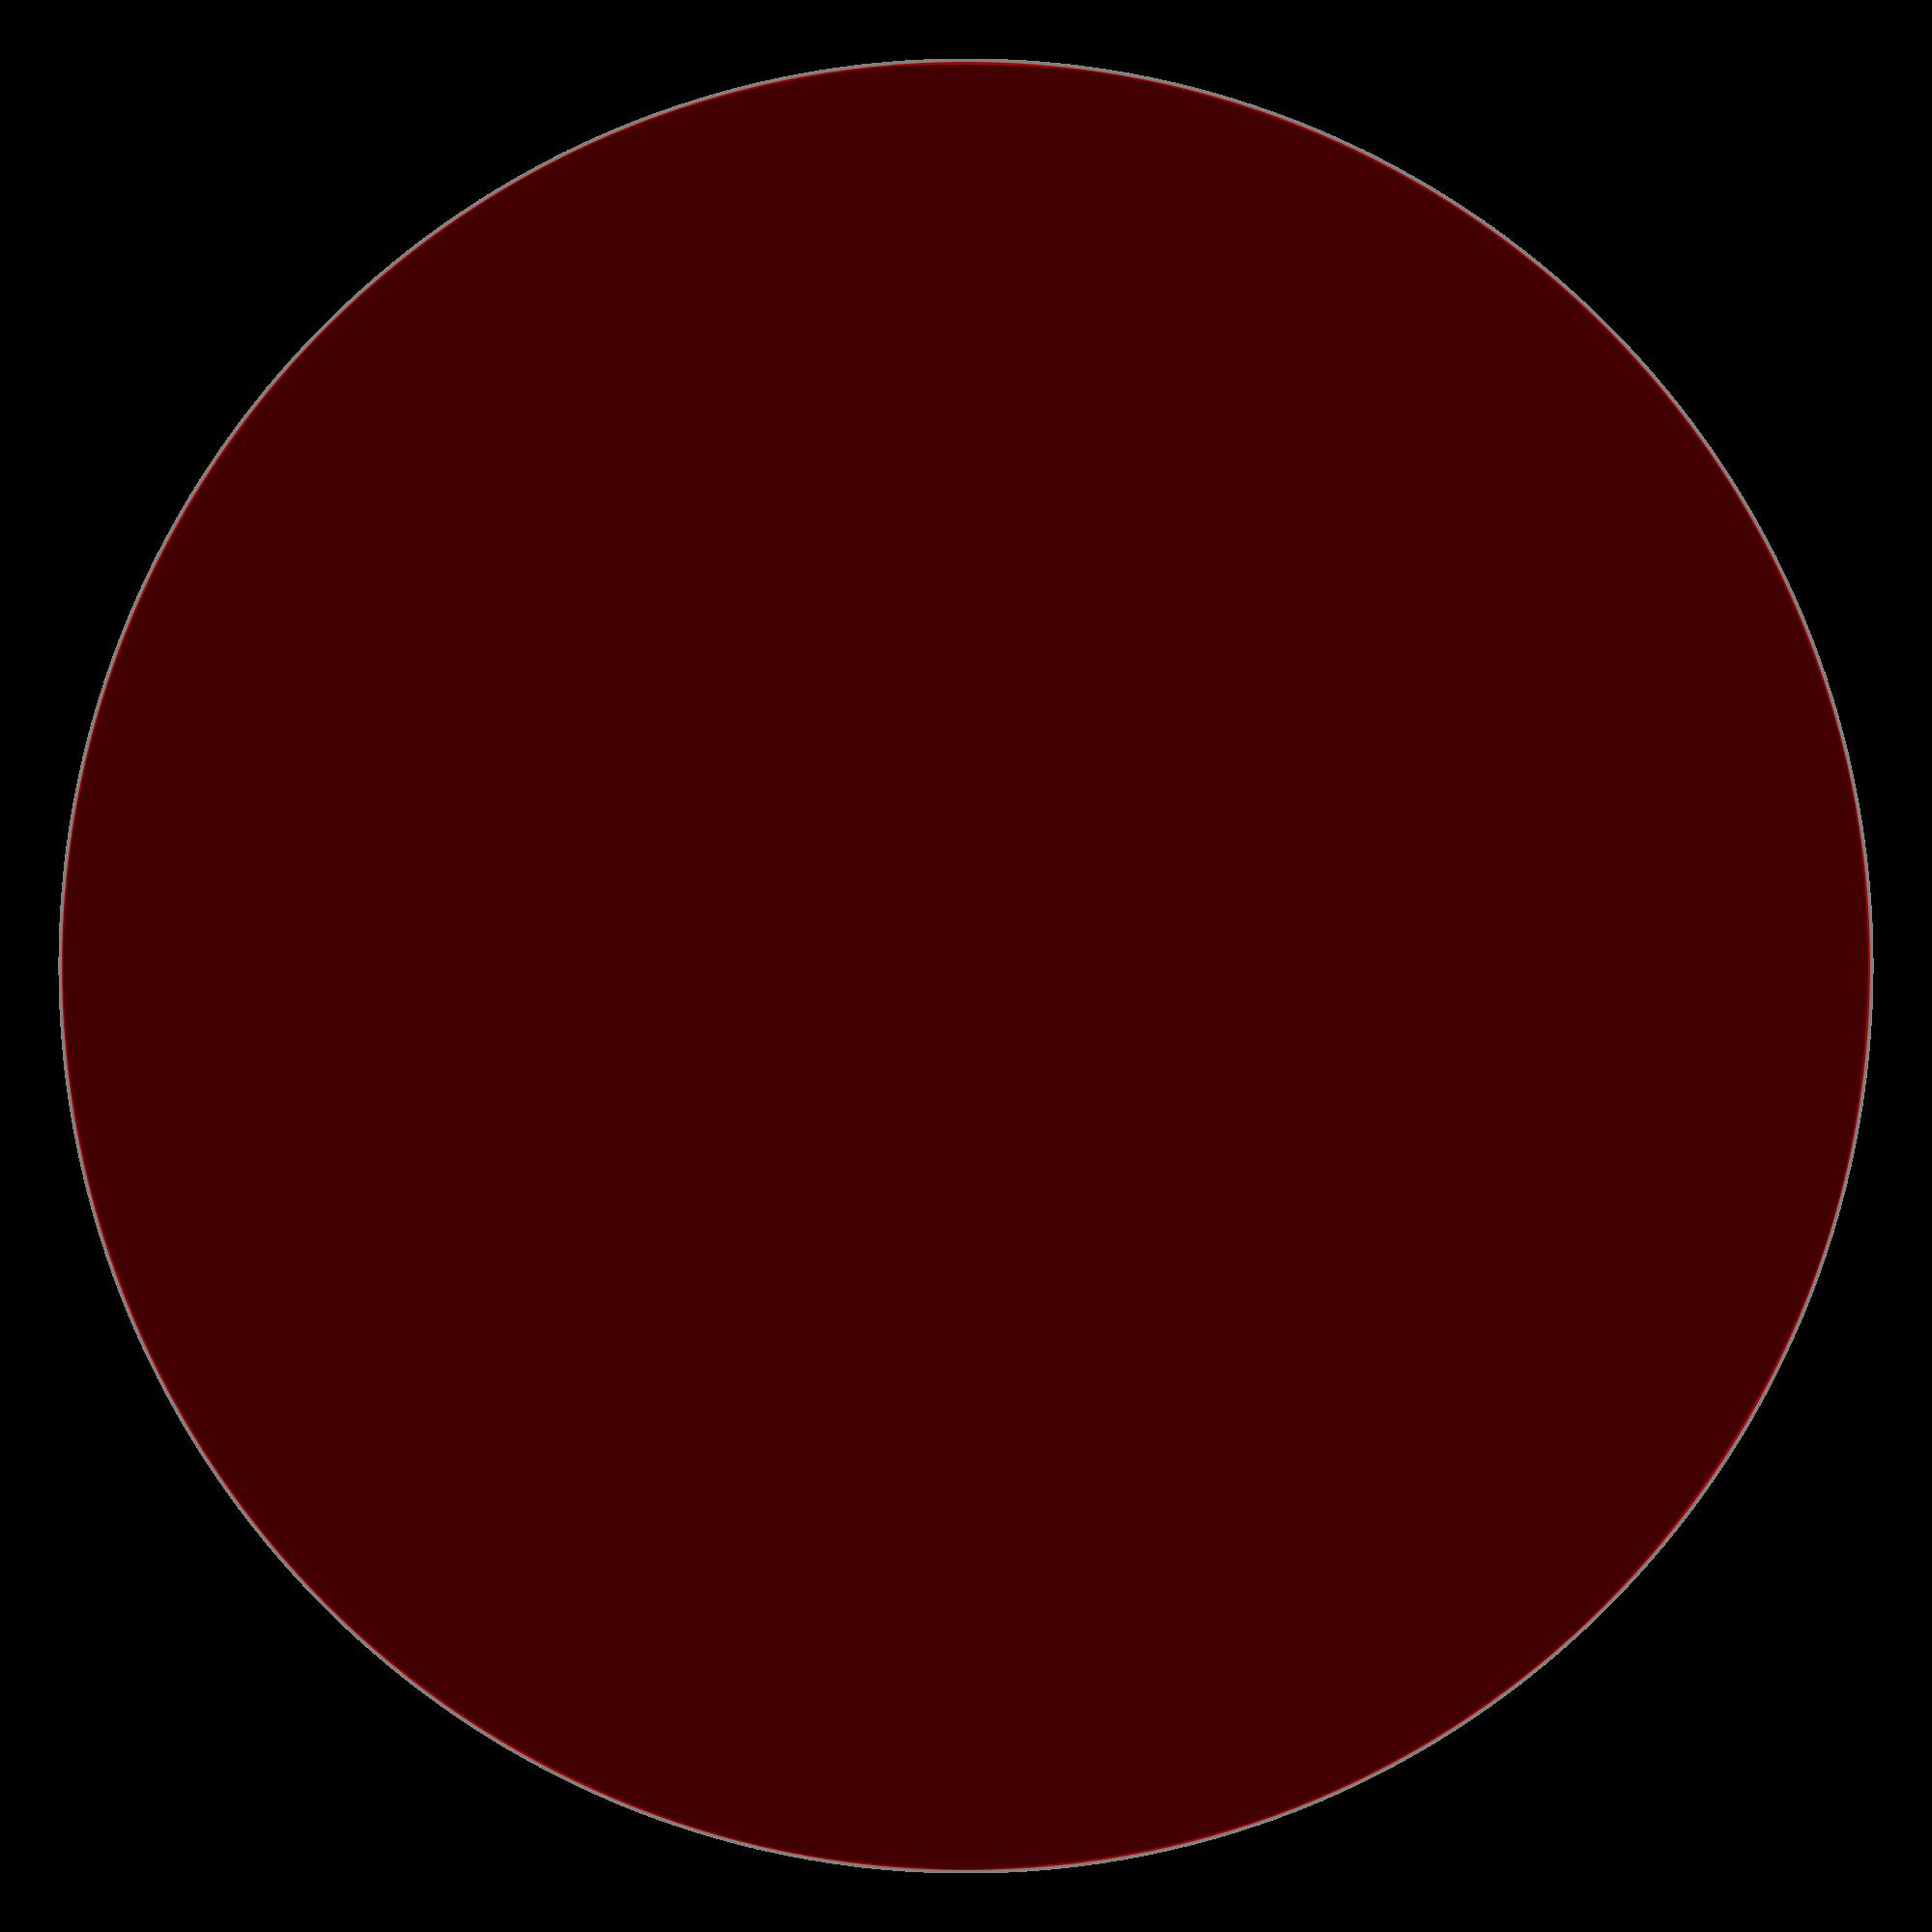 Maroon clipart circle Maroon(1) svg dot File:Location Wikimedia